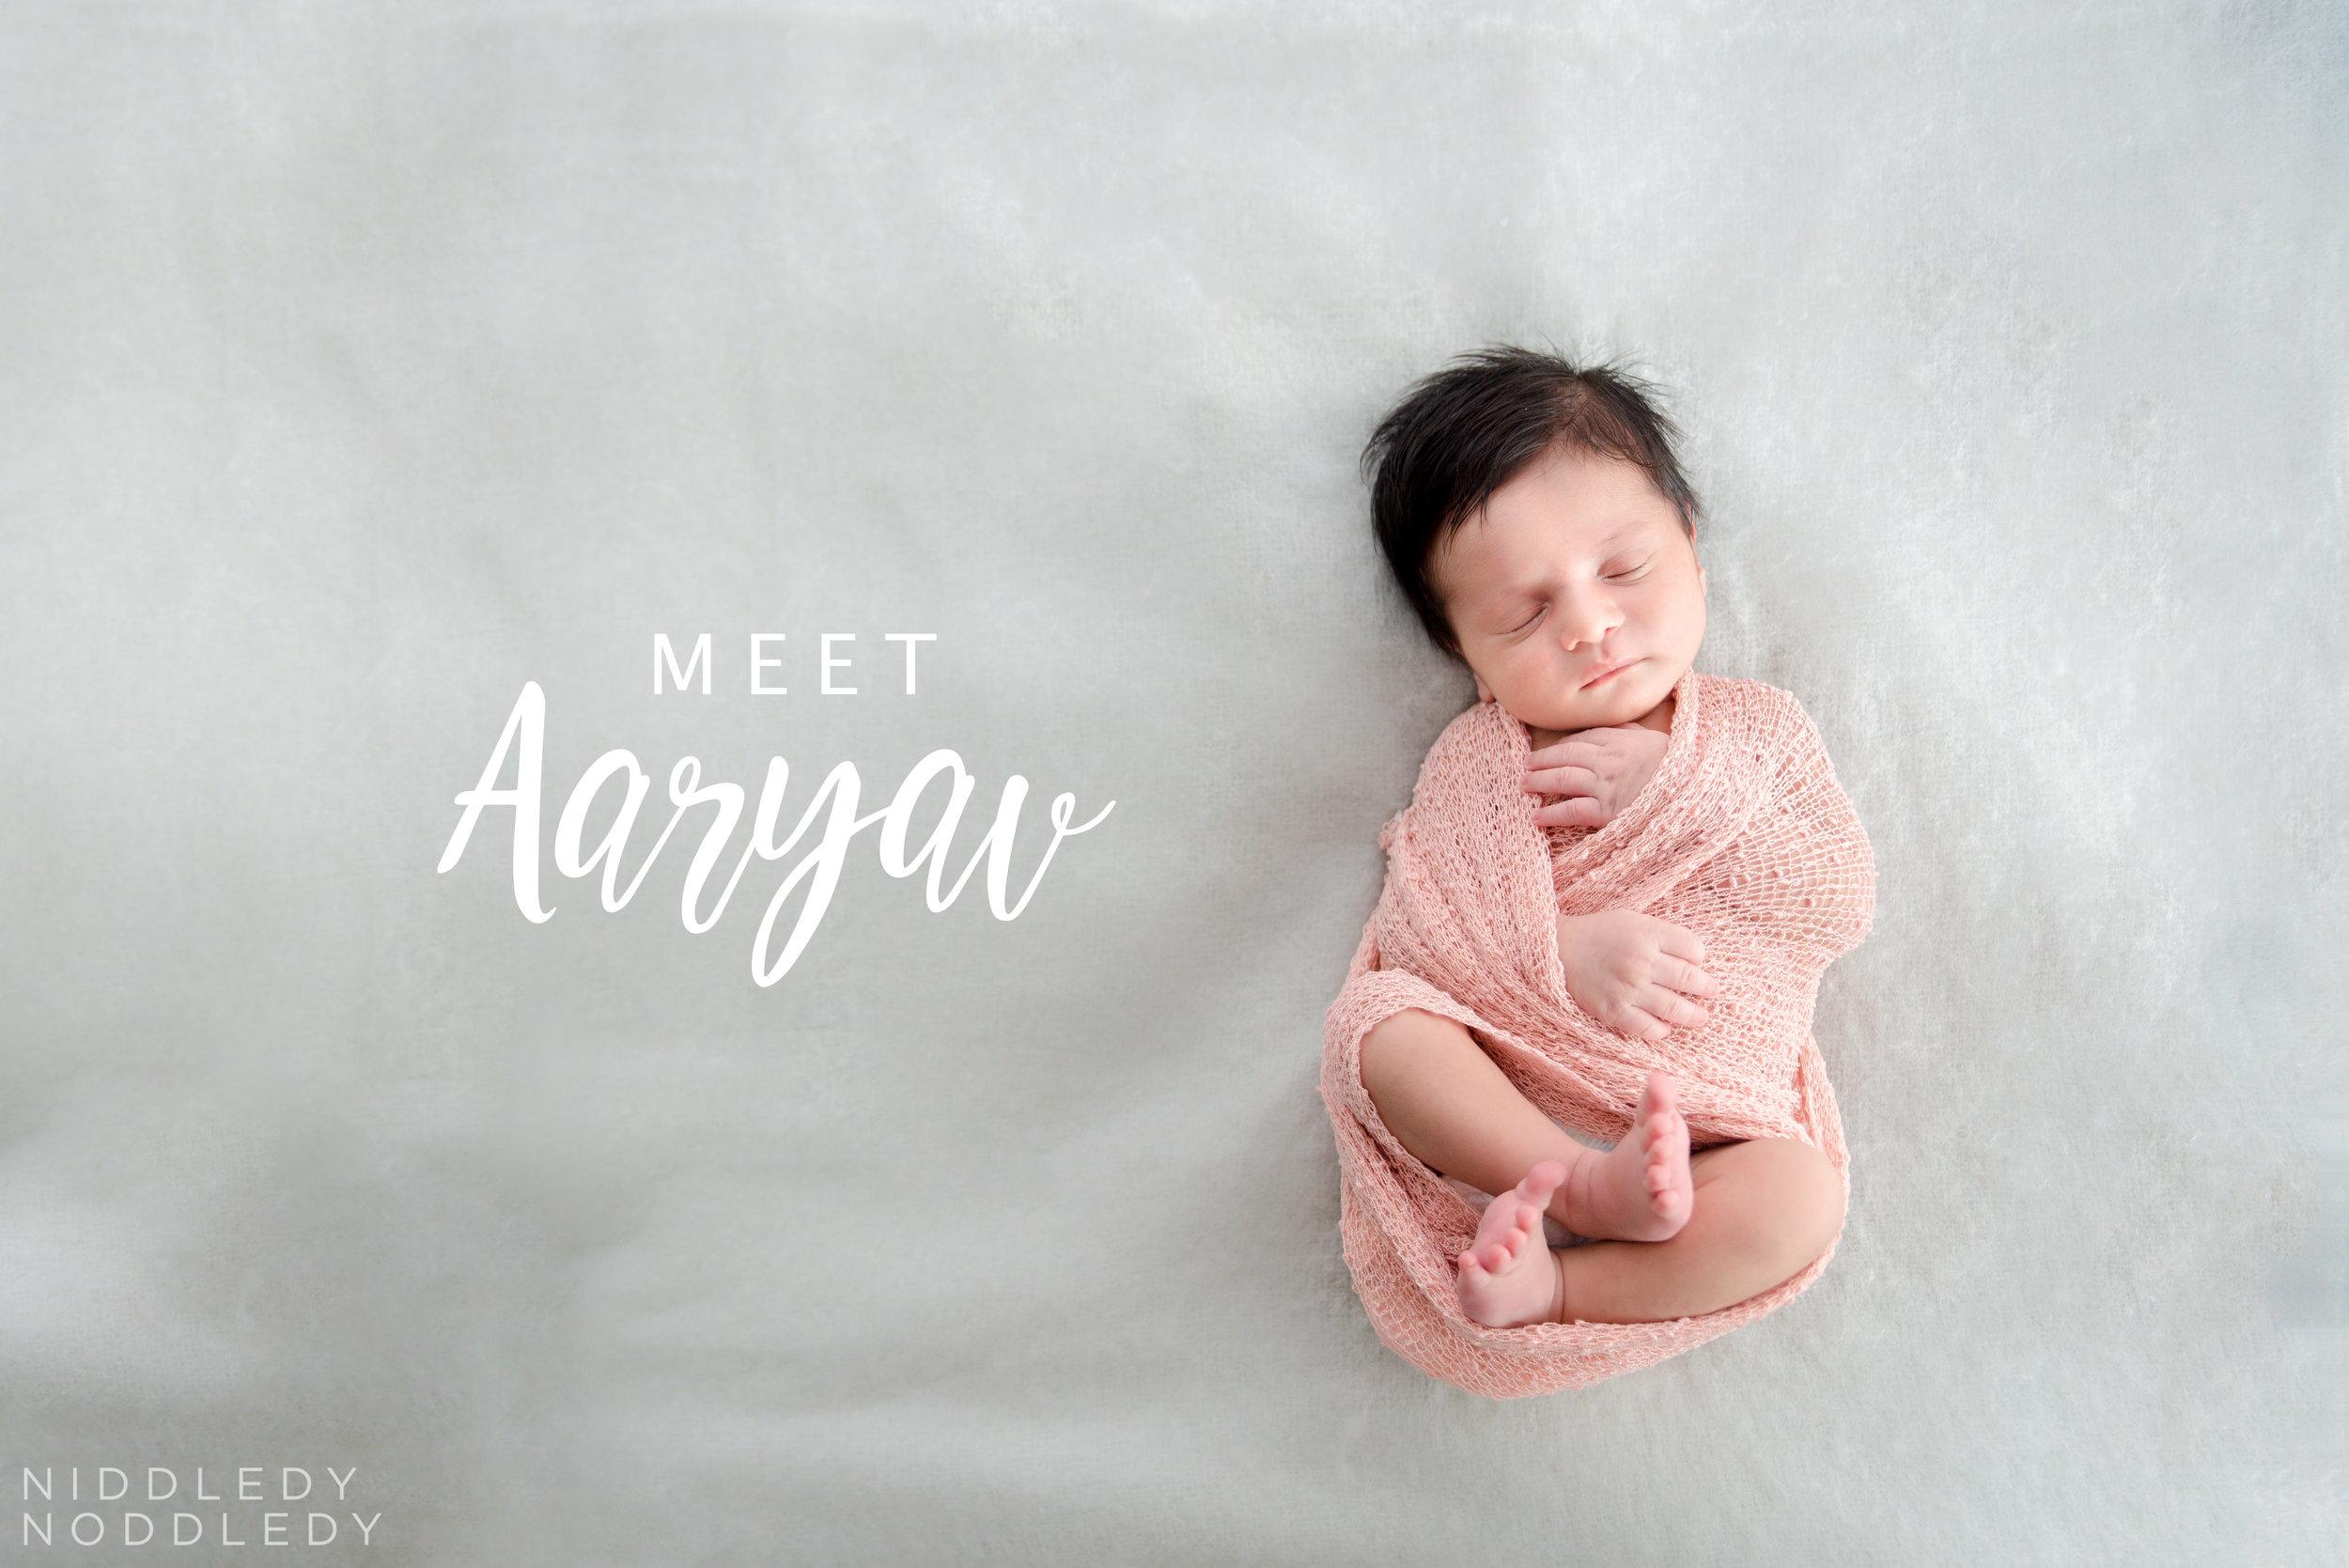 Aaryav Newborn Photoshoot ❤ NiddledyNoddledy.com ~ Bumps to Babies Photography, Kolkata - 04.jpg